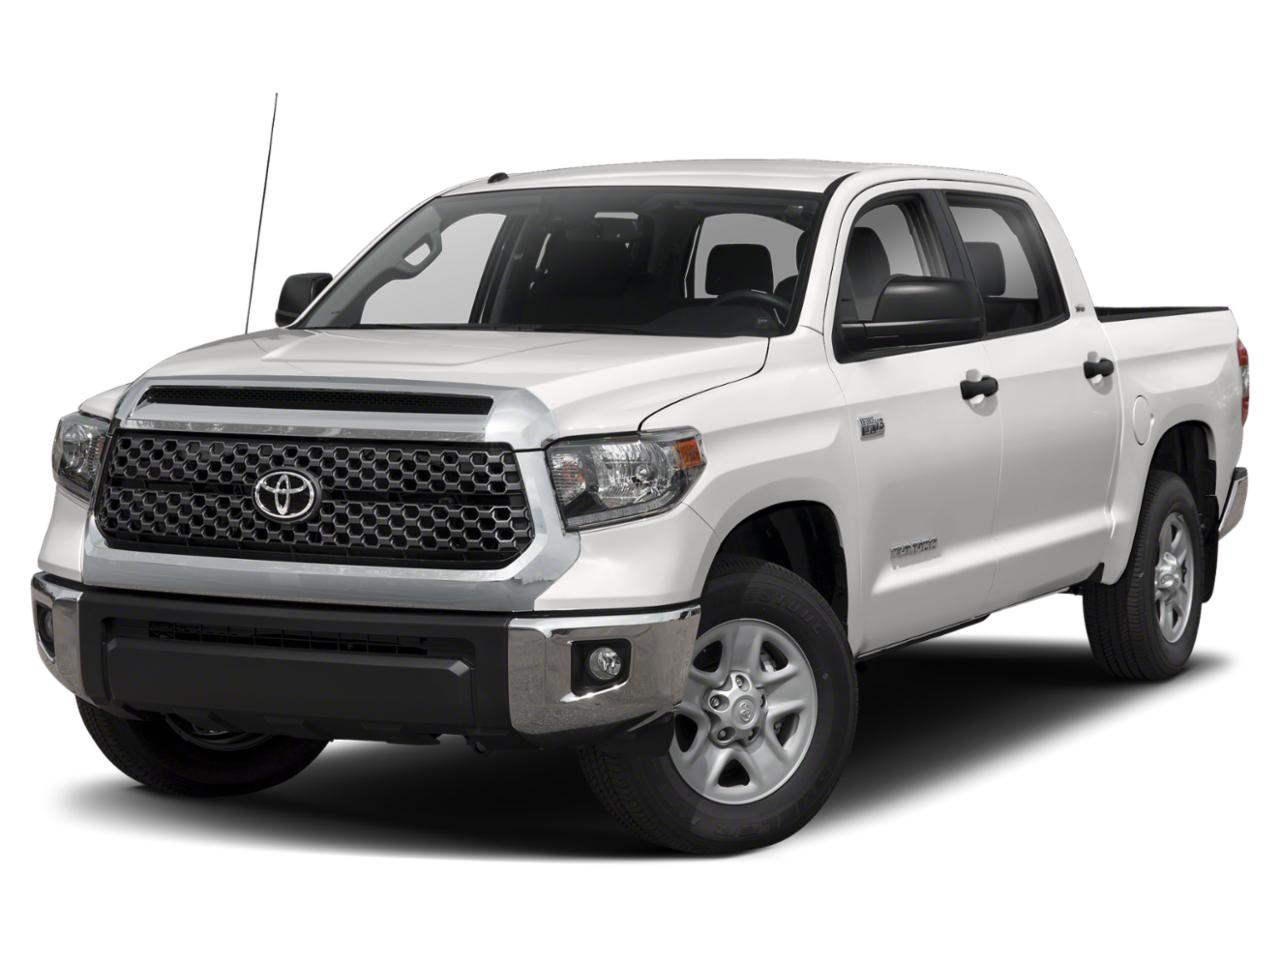 2020 Toyota Tundra 4WD Vehicle Photo in TUCSON, AZ 85705-6014